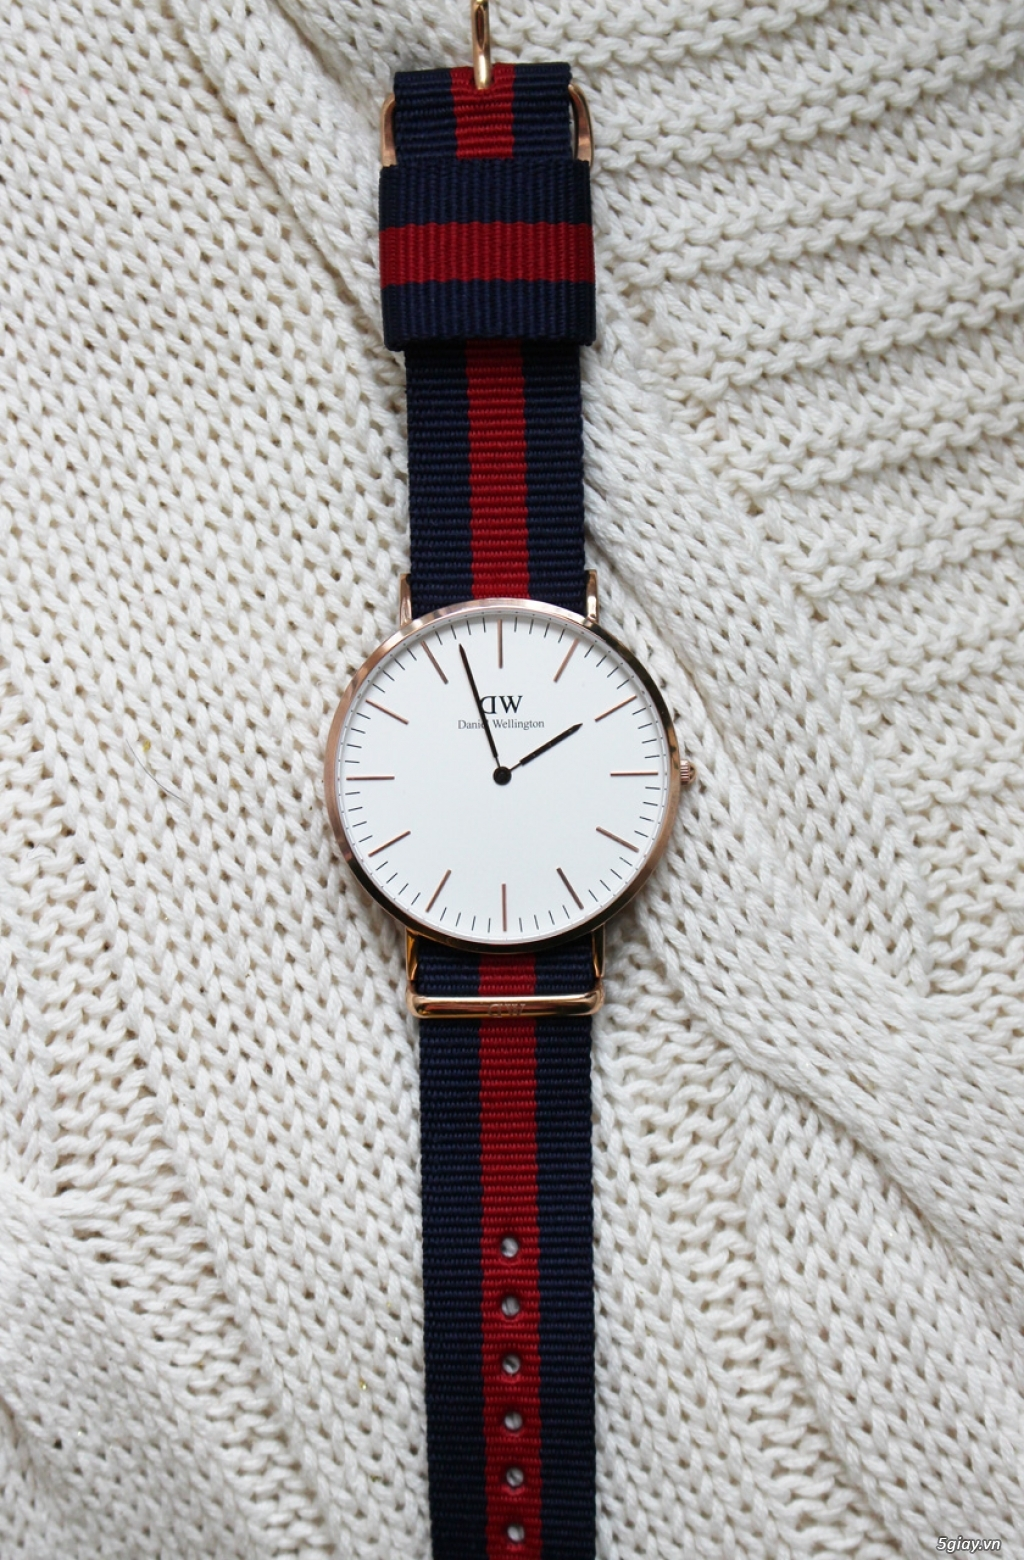 <Authentic> Đồng hồ mới 100% ship US: Movado, Seiko, Daniel Wellington, Victorinox...giá tốt - 27